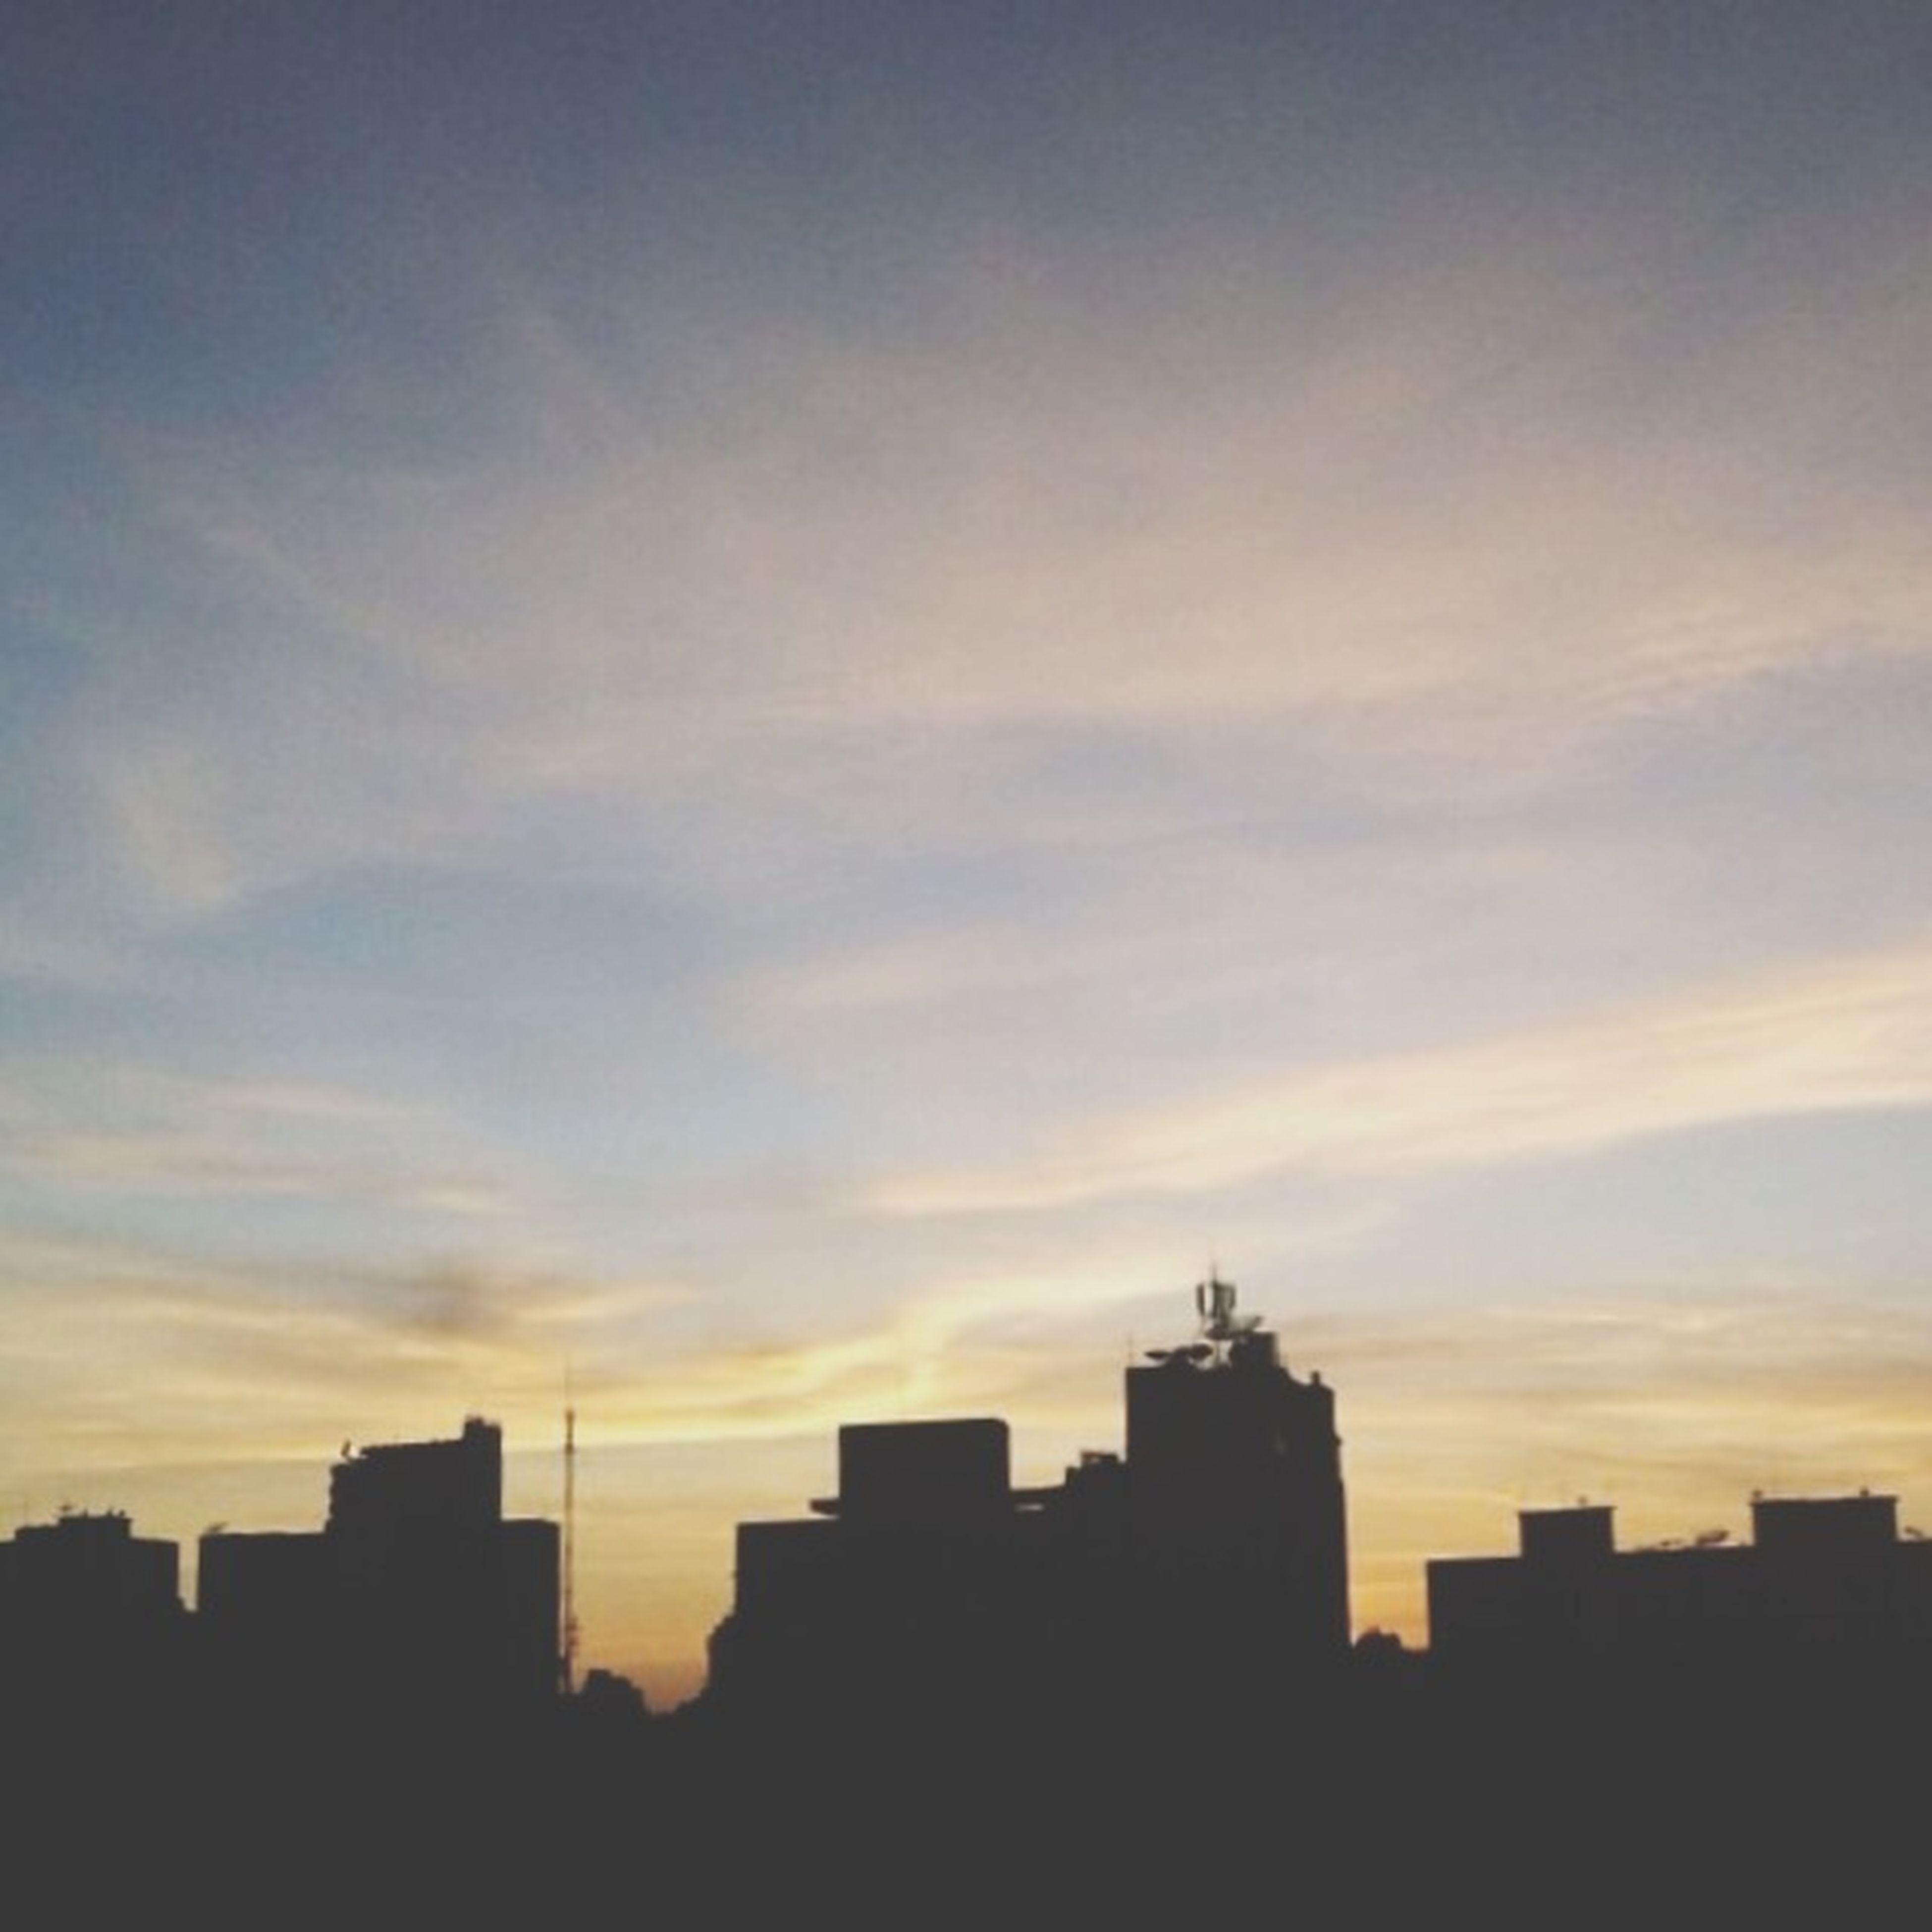 building exterior, architecture, sunset, built structure, silhouette, sky, city, orange color, building, cloud - sky, residential structure, residential building, cityscape, cloud, low angle view, outdoors, no people, outline, nature, dusk